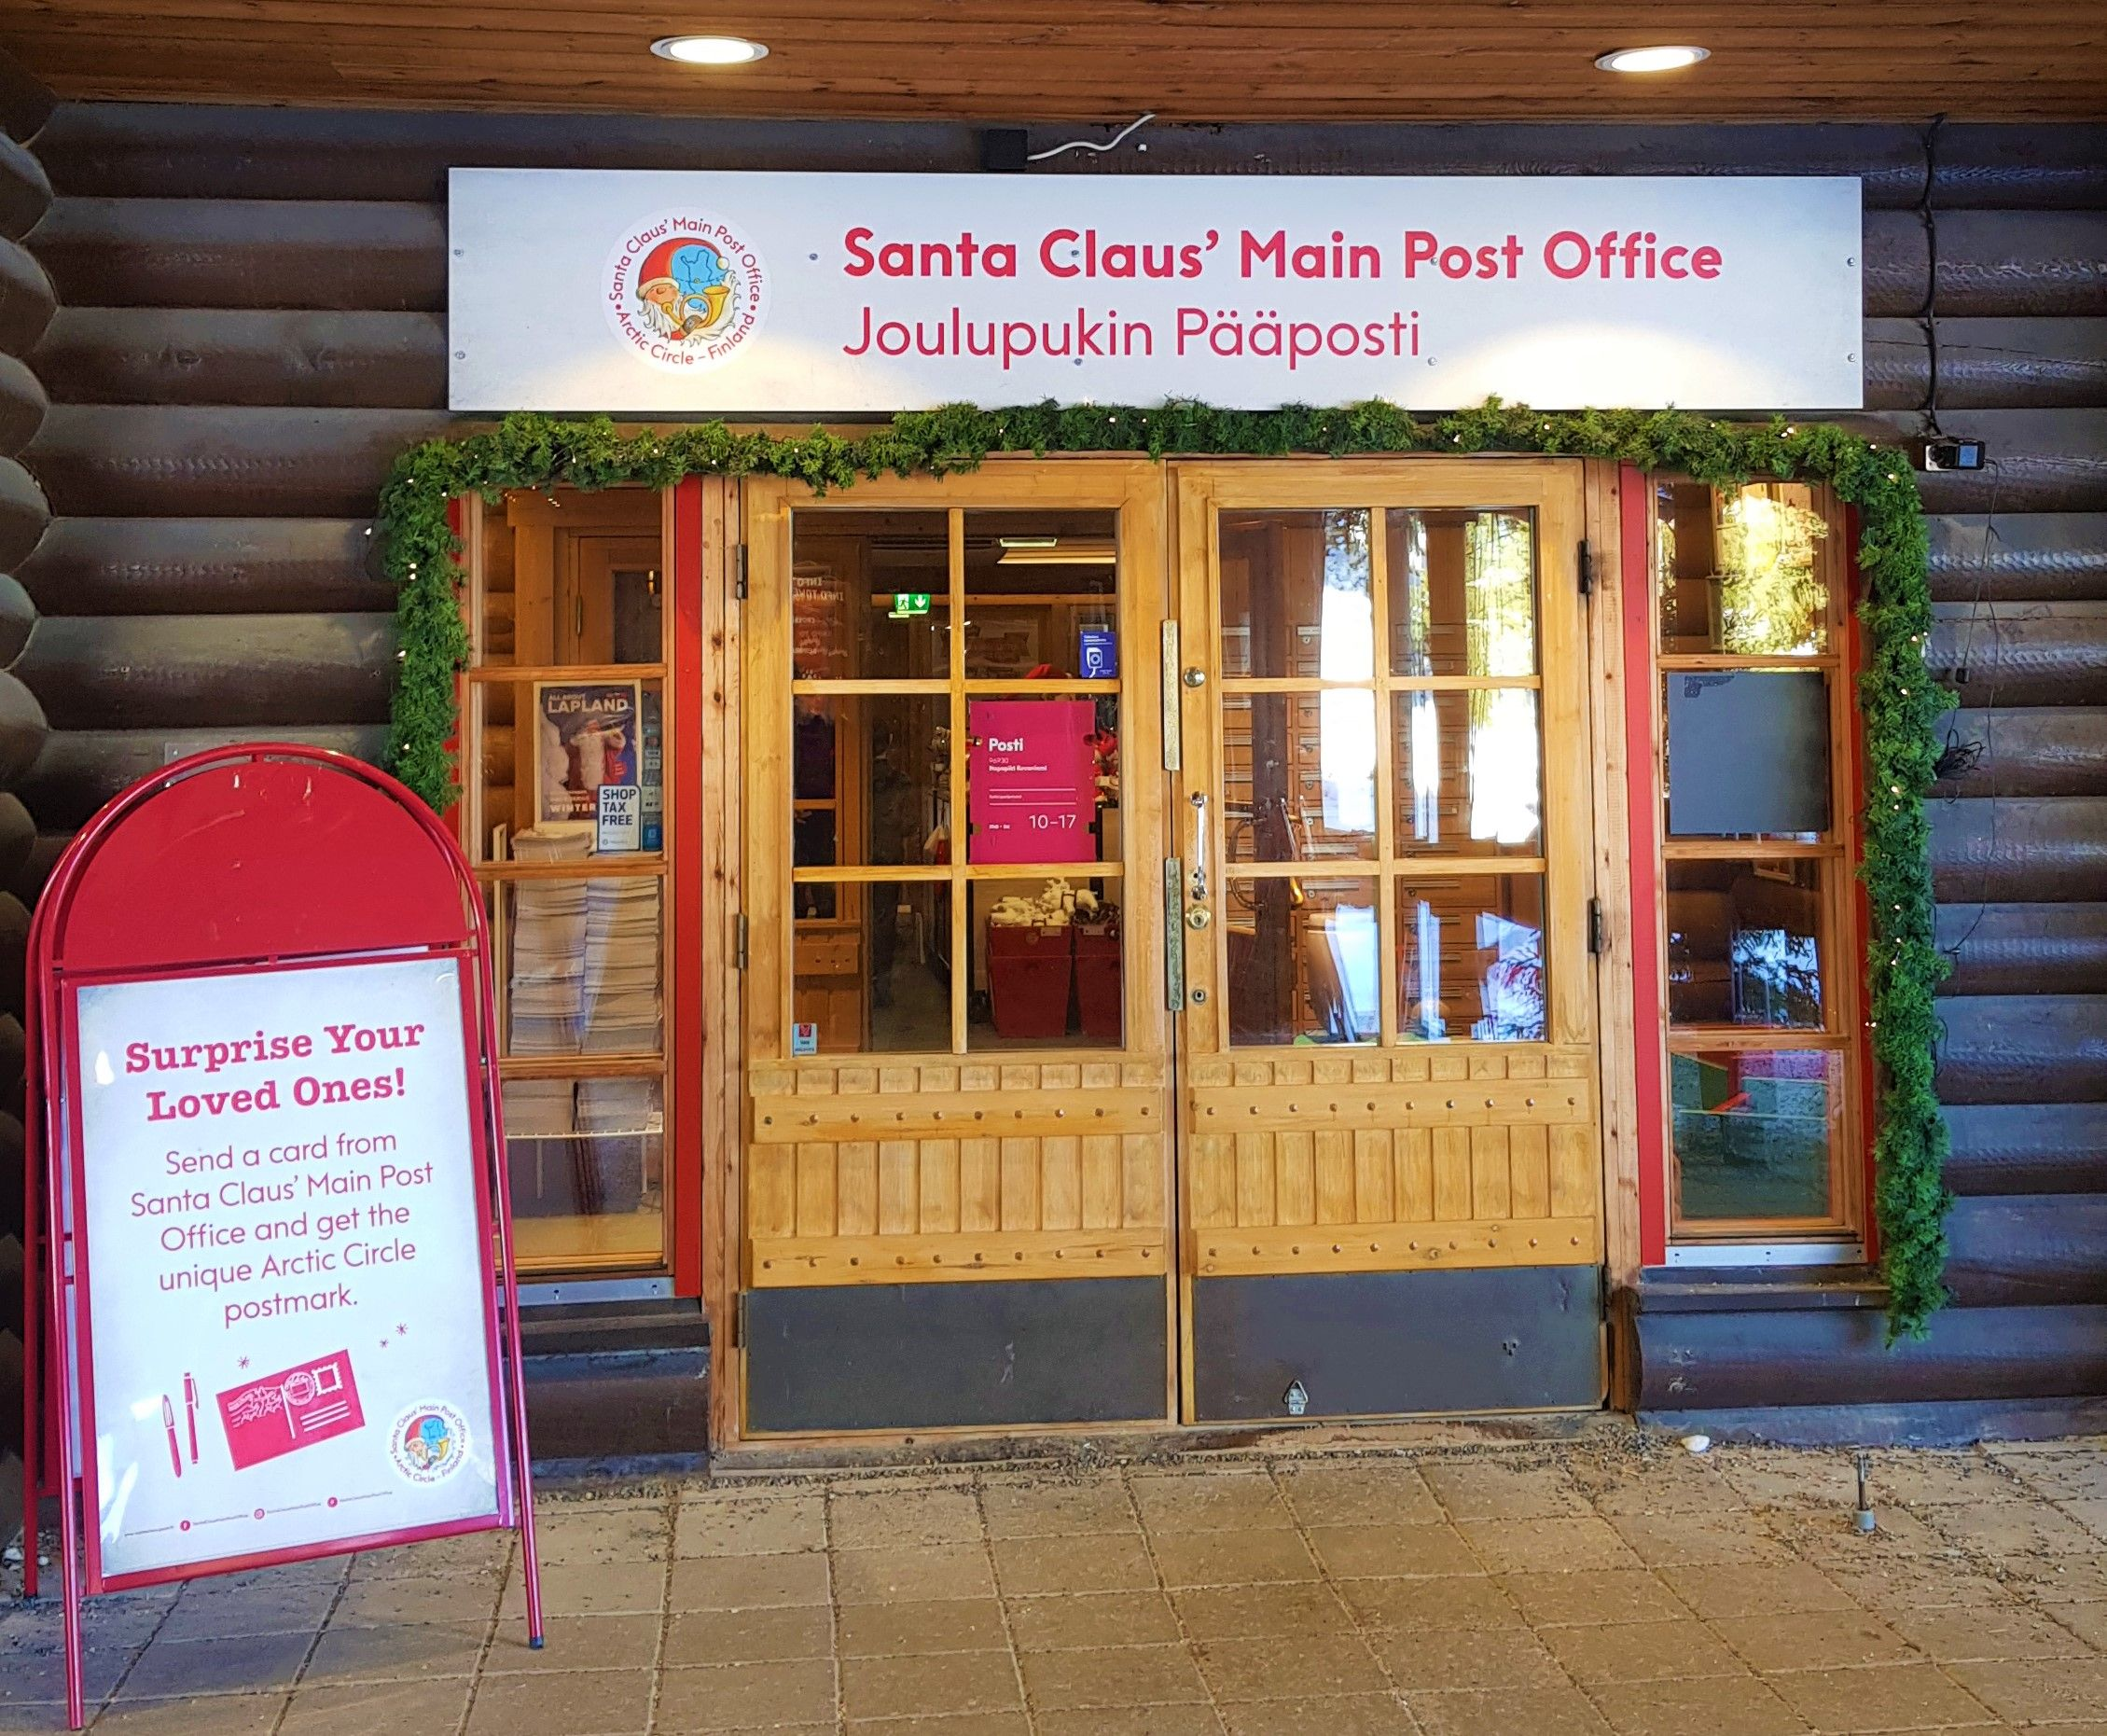 Puerta de la oficina postal de Santa Claus.